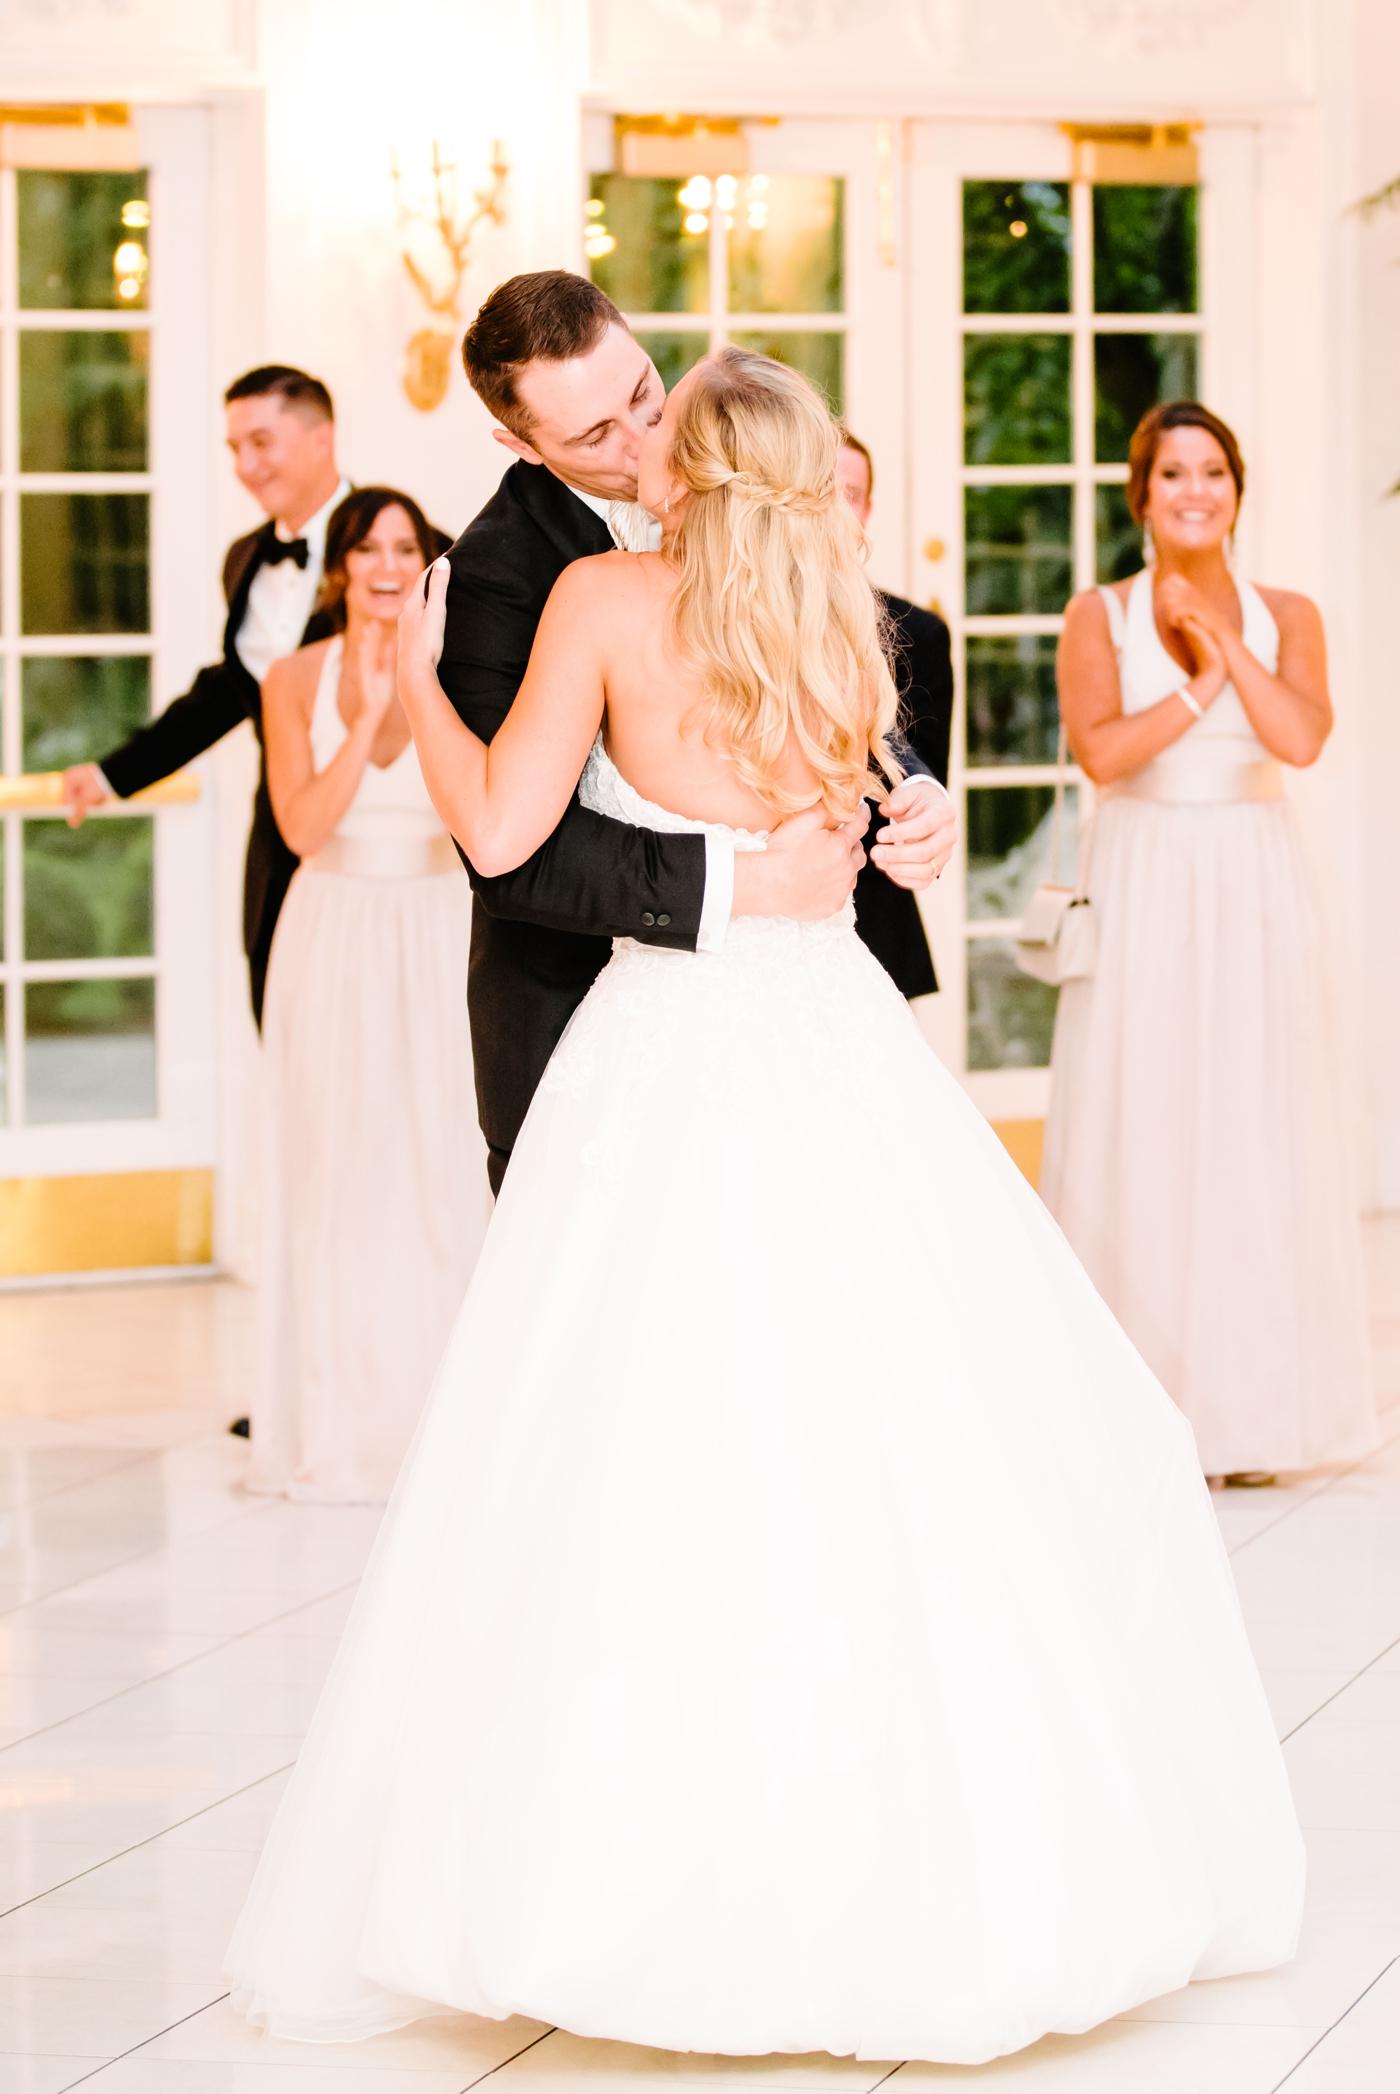 chicago-fine-art-wedding-photography-rubright51